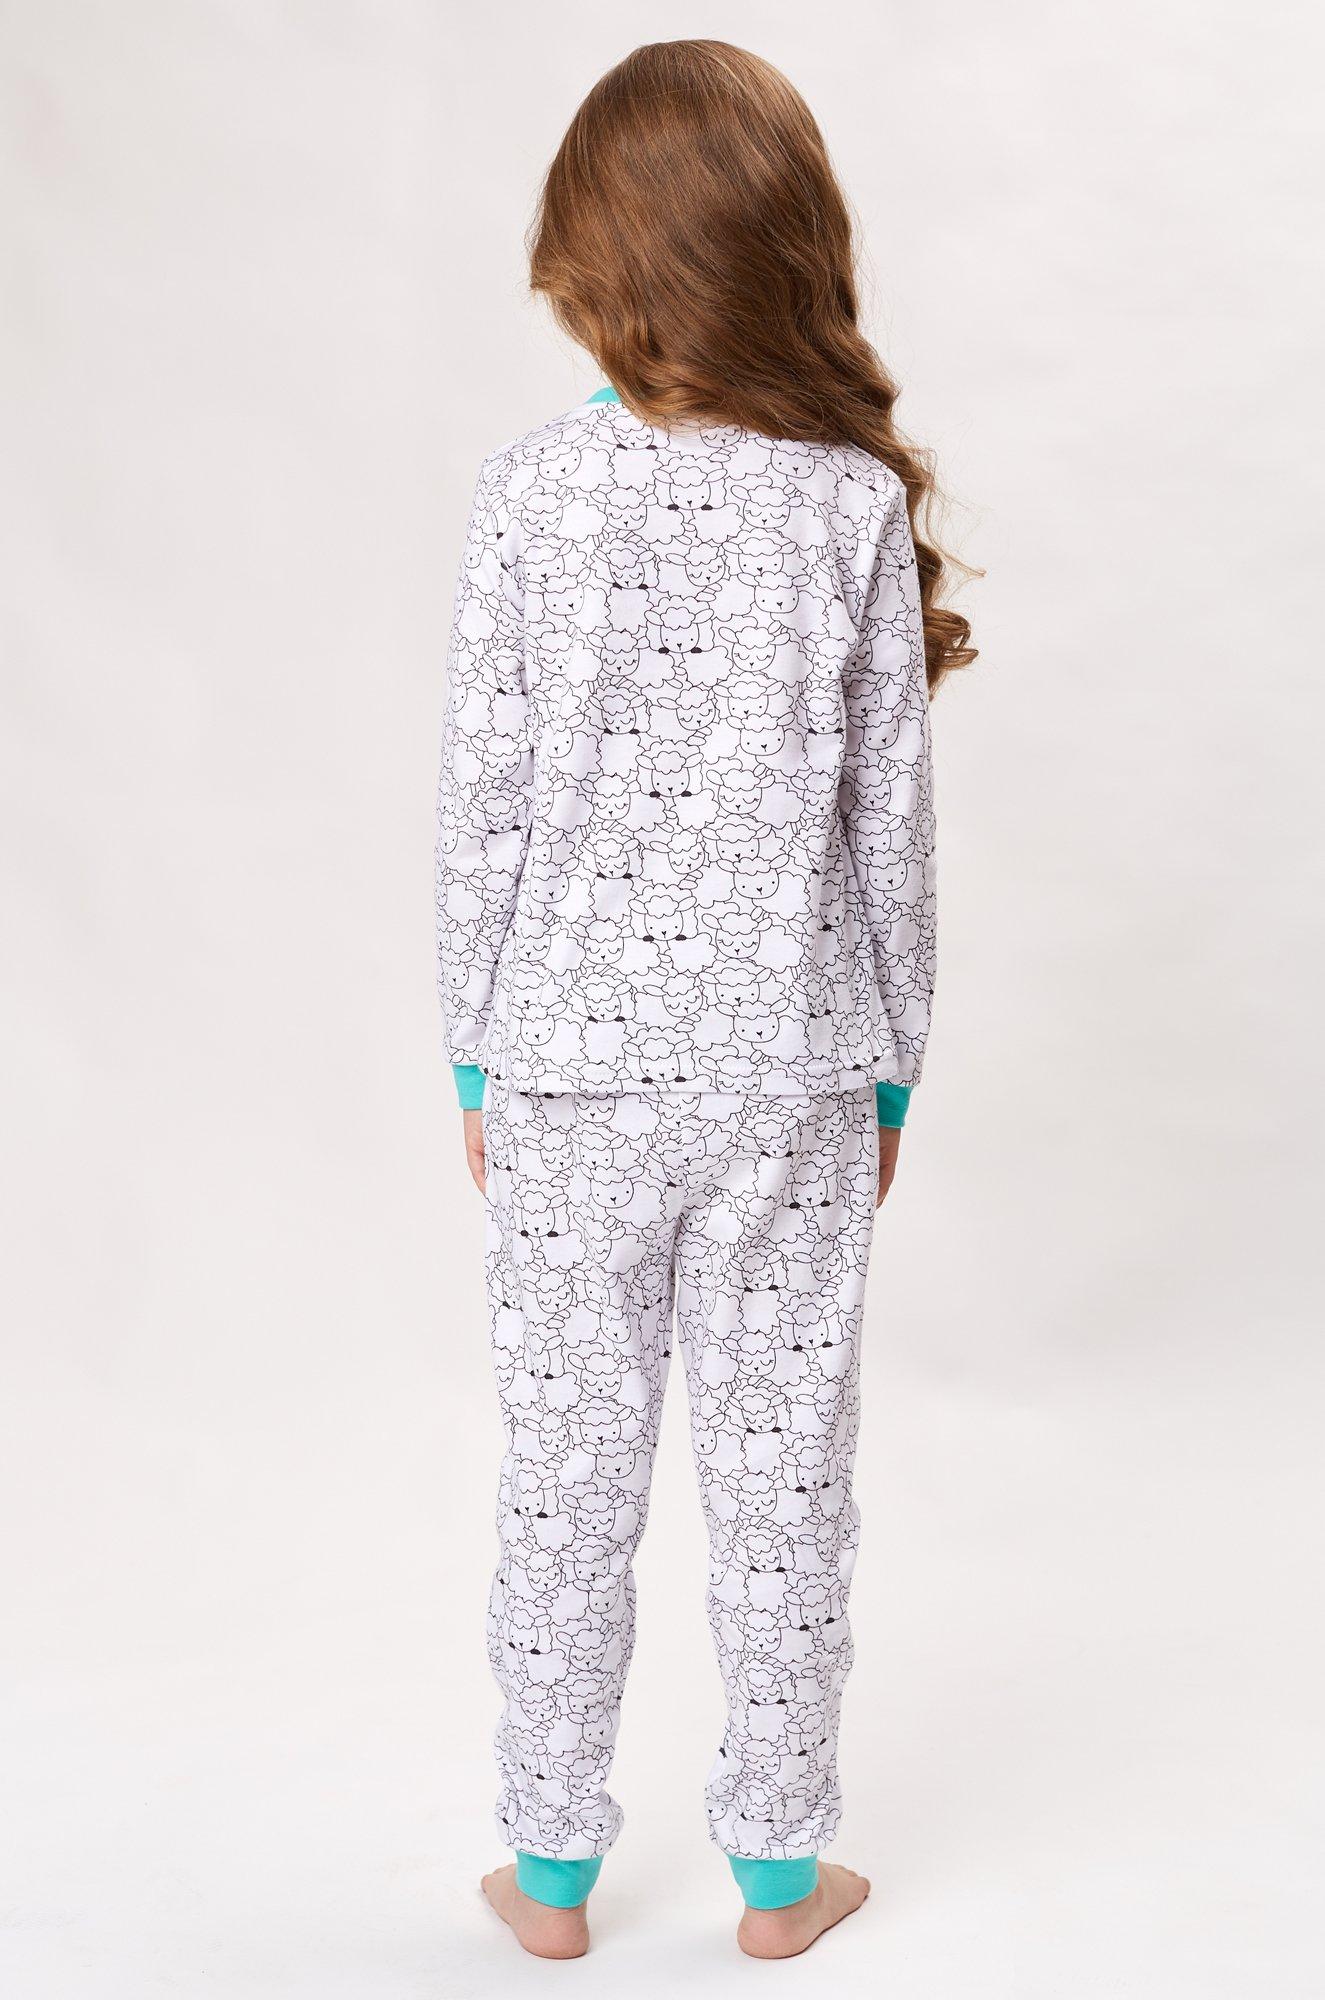 5975213abfbf Пижама для девочки Umka 6532263 белый купить оптом в HappyWear.ru